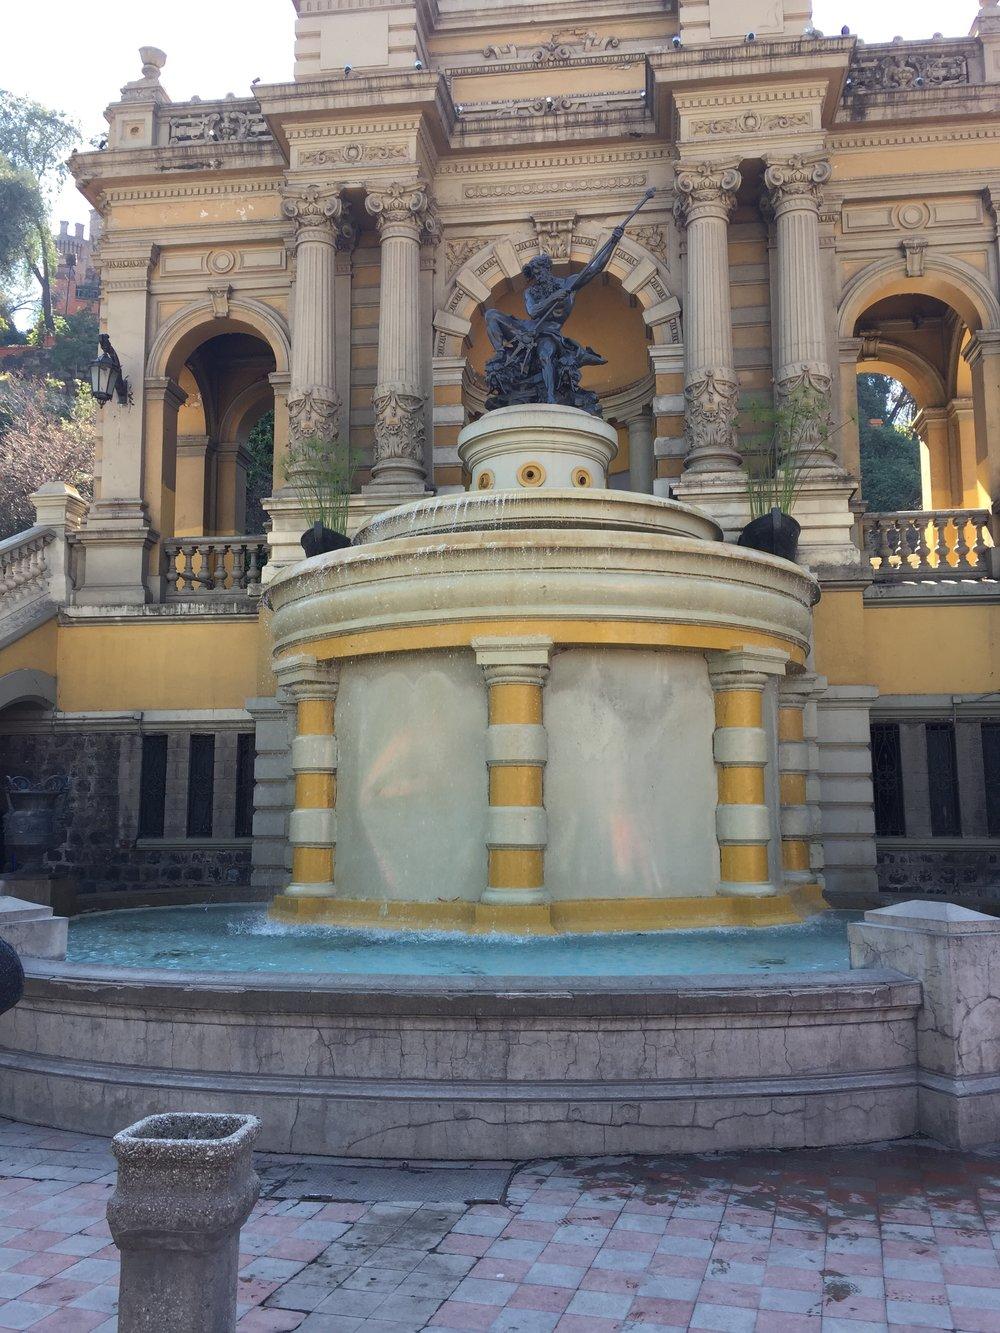 Fountains, fountains, everywhere.